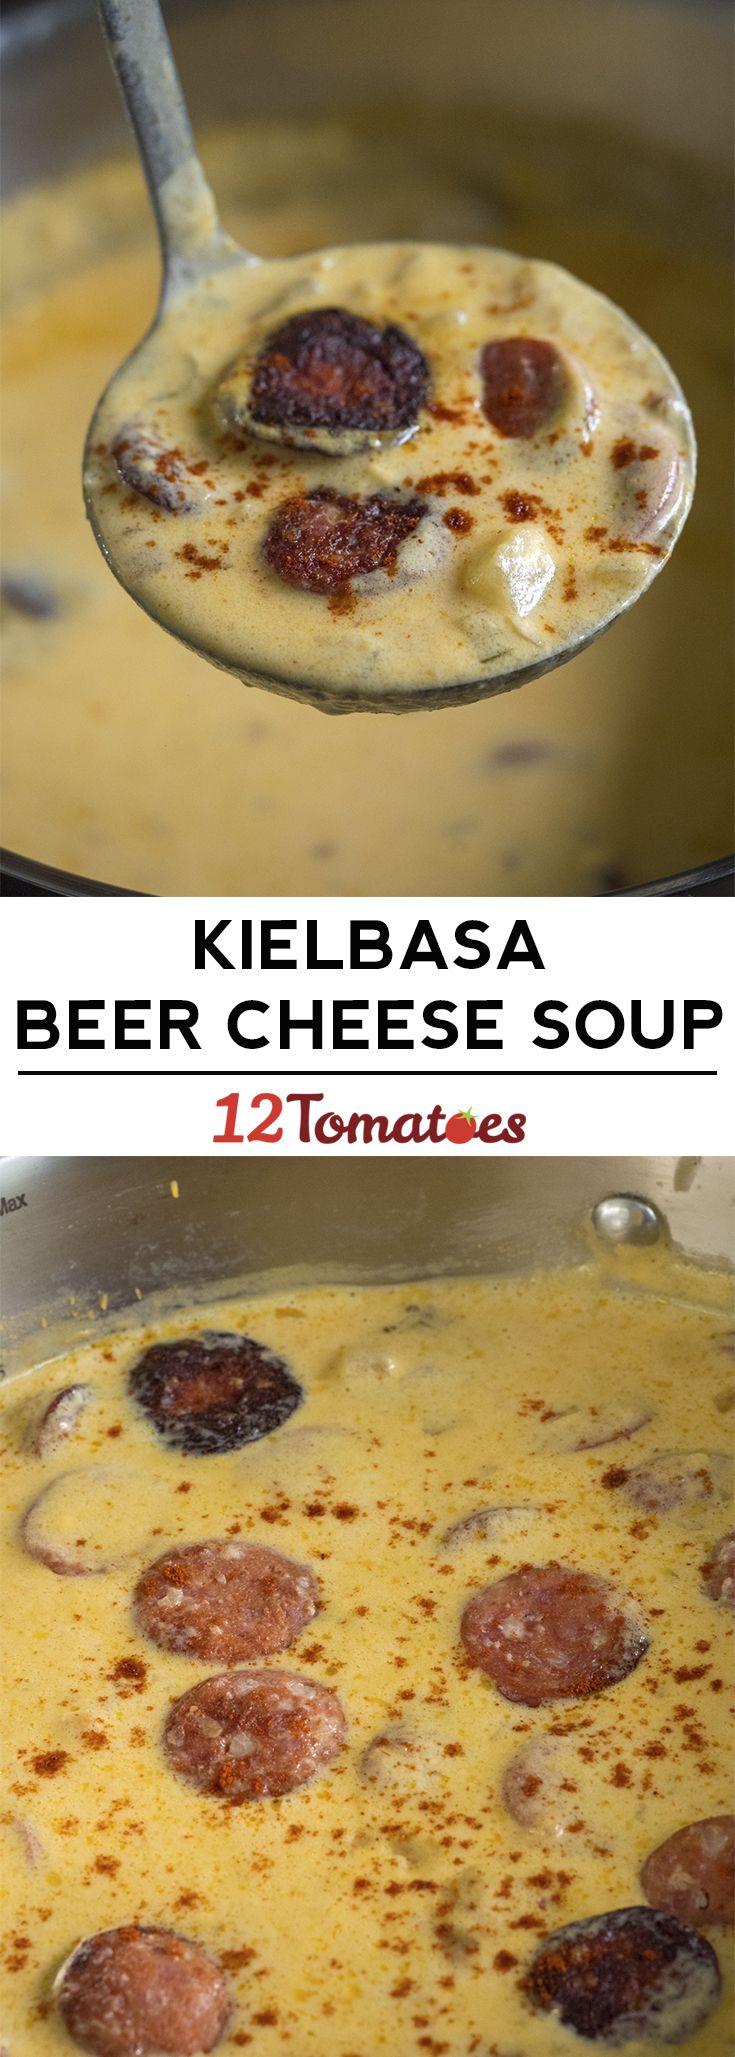 Kielbasa Beer Cheese Soup